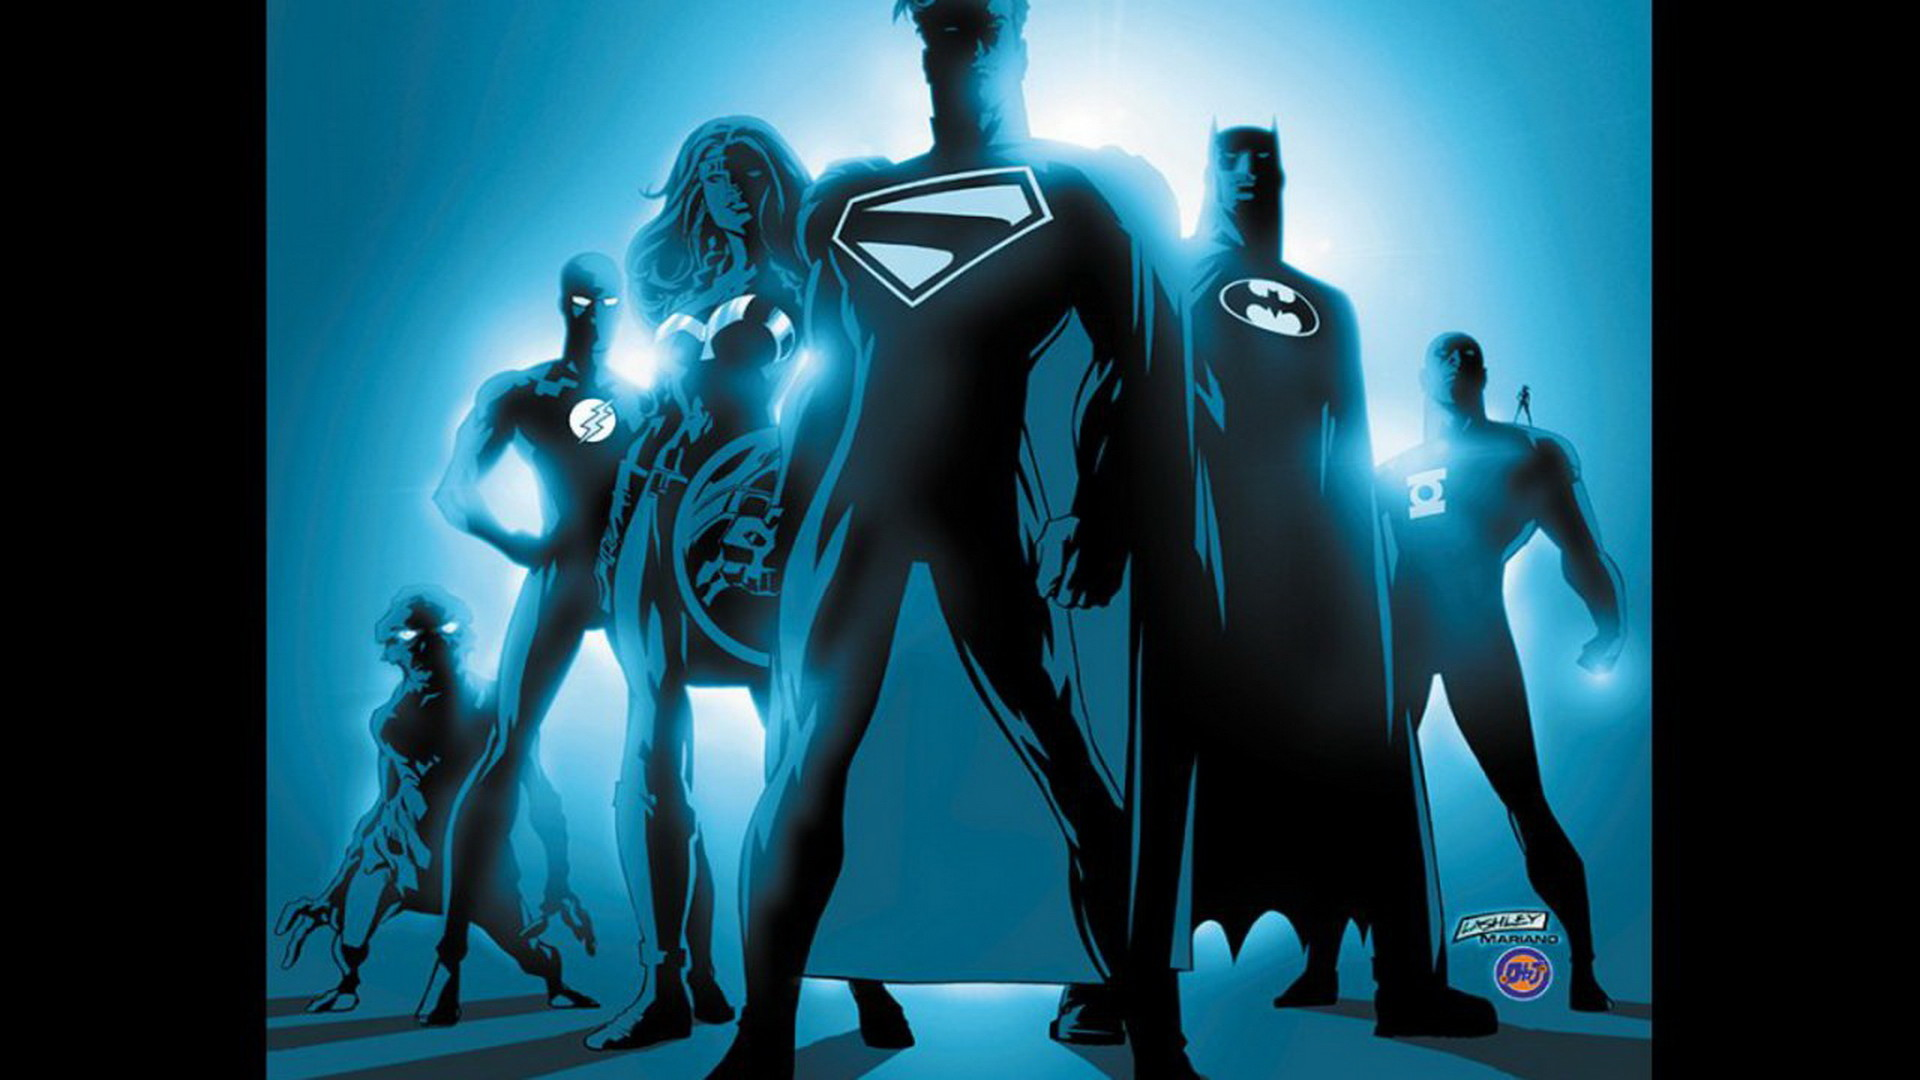 Justice League Wallpaper, Cool Justice League Backgrounds | 38